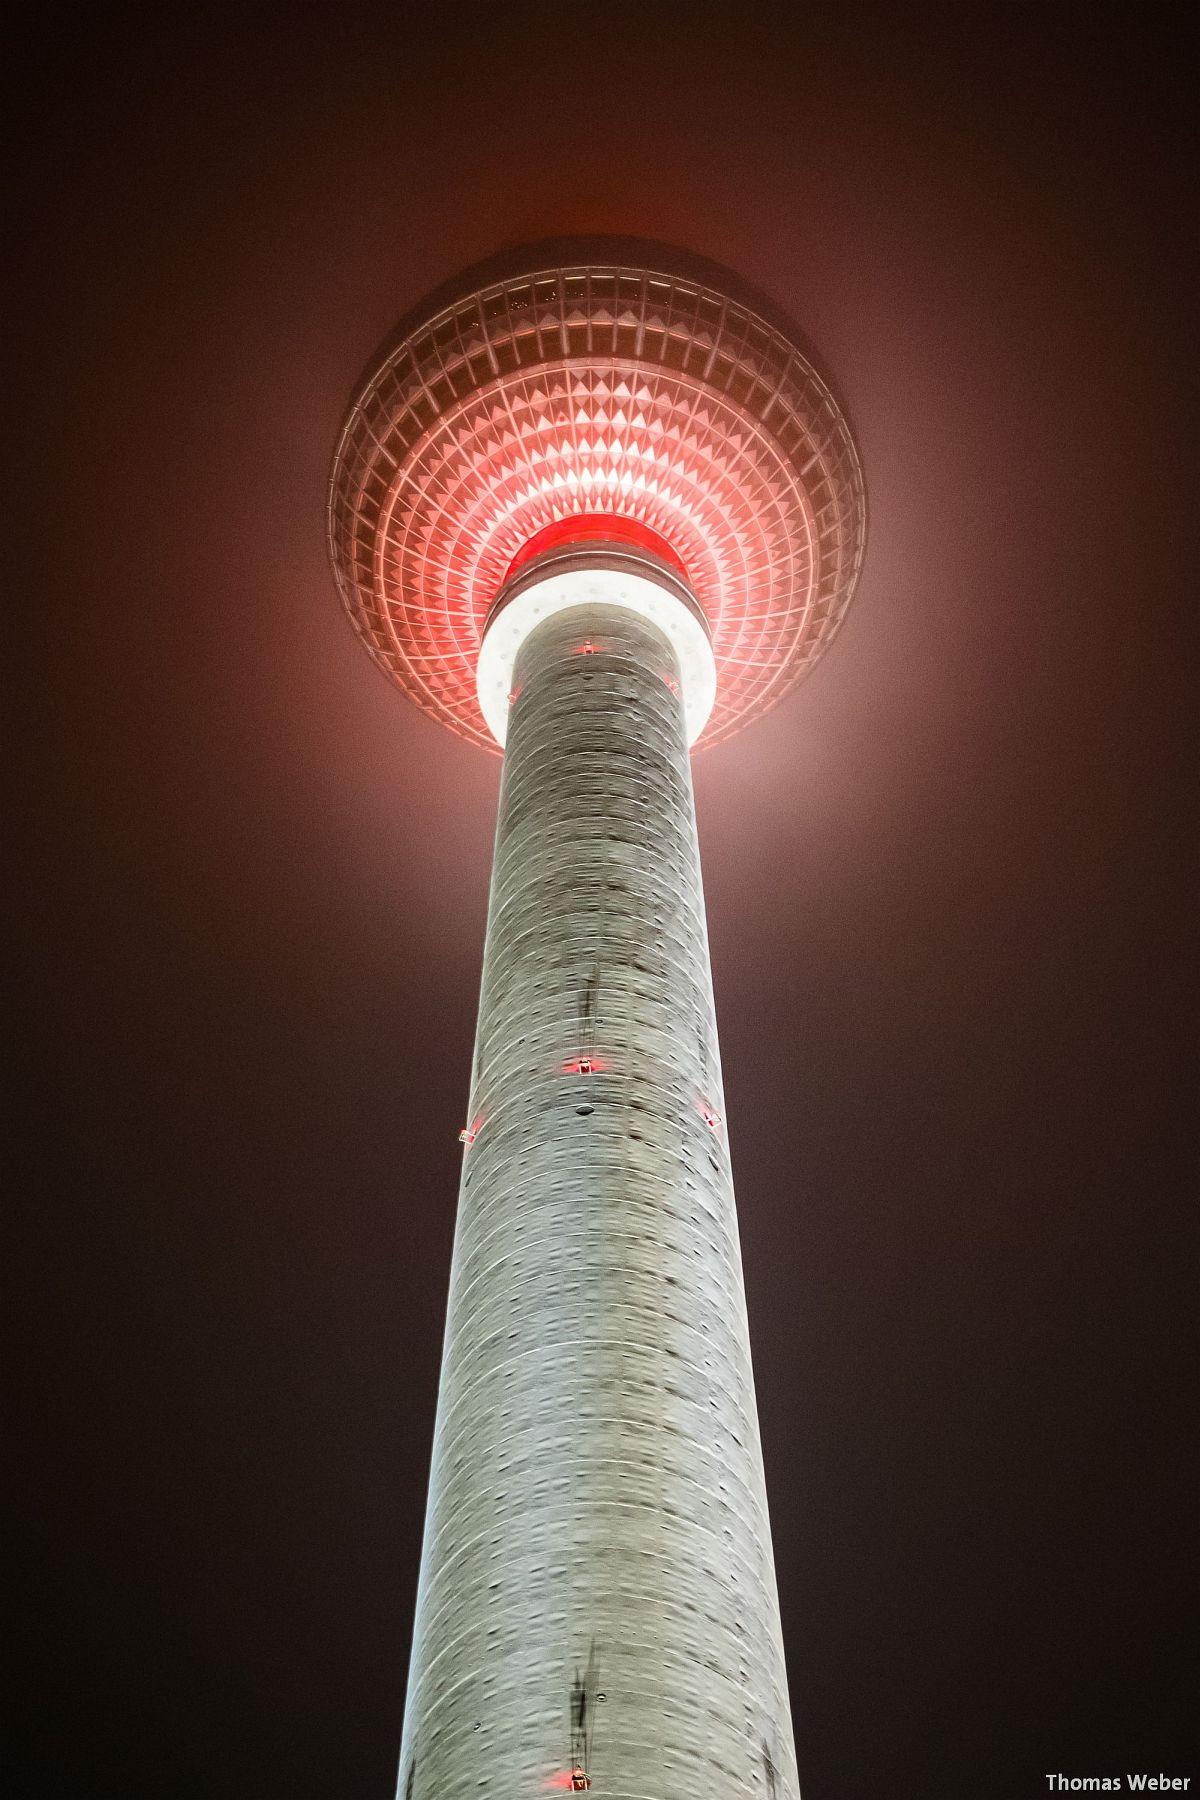 Fotograf Thomas Weber aus Oldenburg: Der Fernsehturm am Alexanderplatz in Berlin